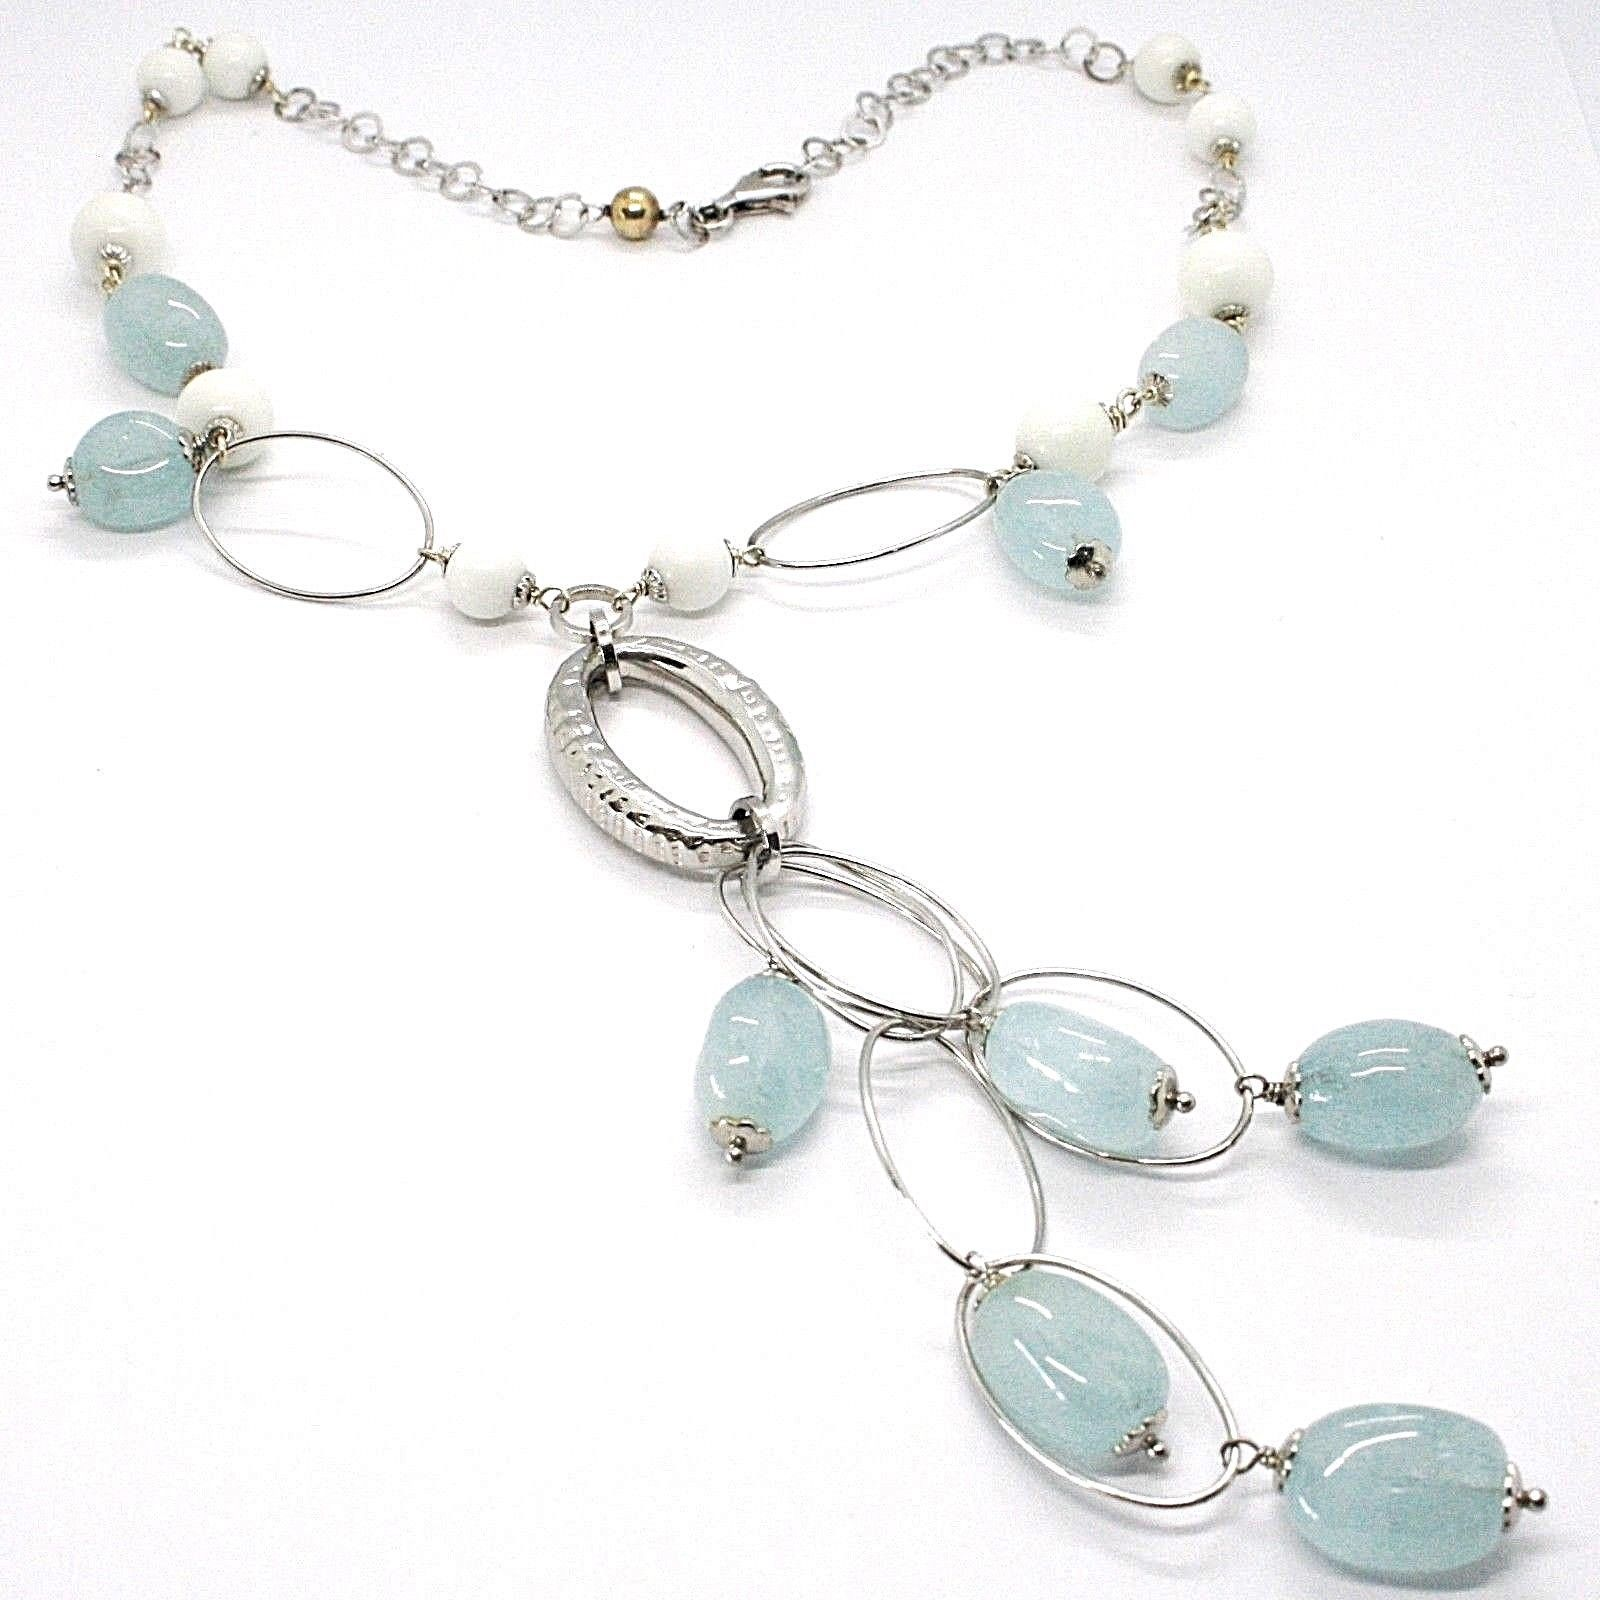 Necklace Silver 925, Spheres Agate White, Aquamarine Drop, Pendant, Ovals